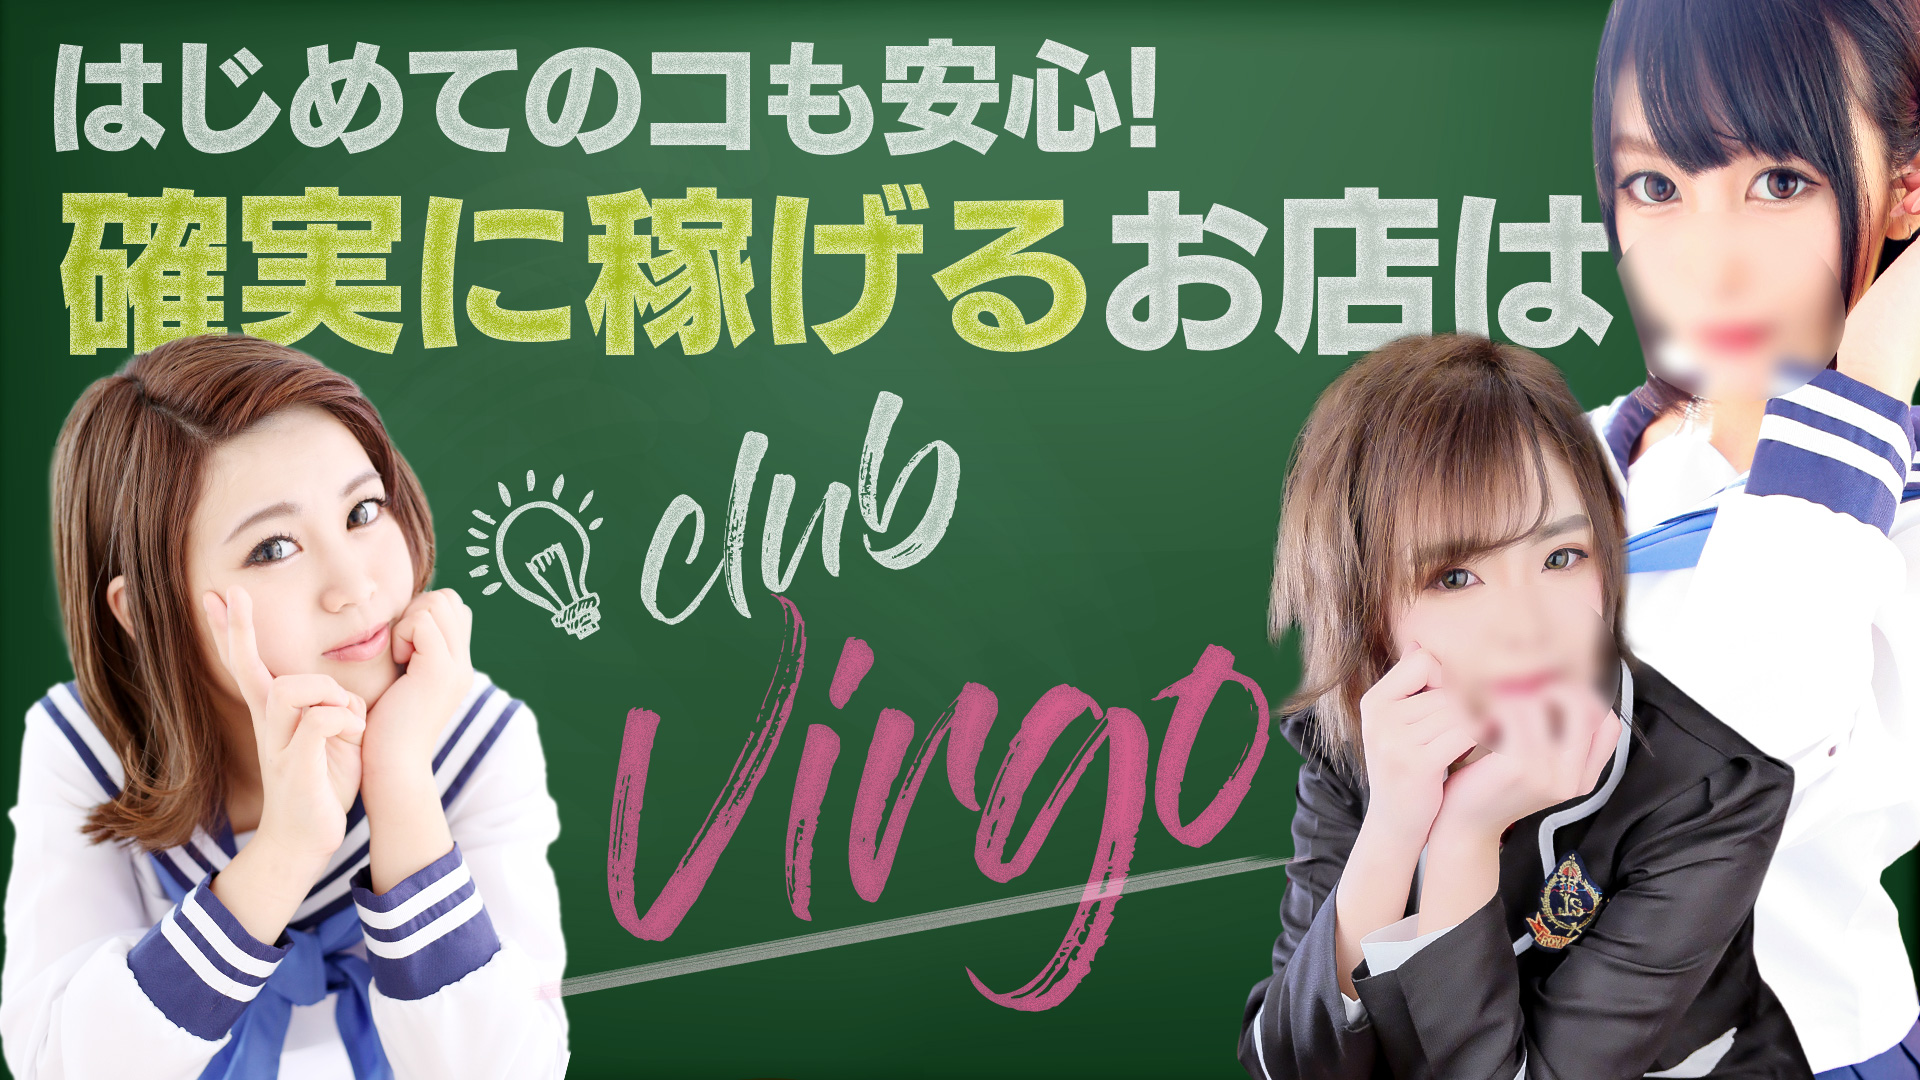 CLUB VIRGO(ヴィルゴグループ)